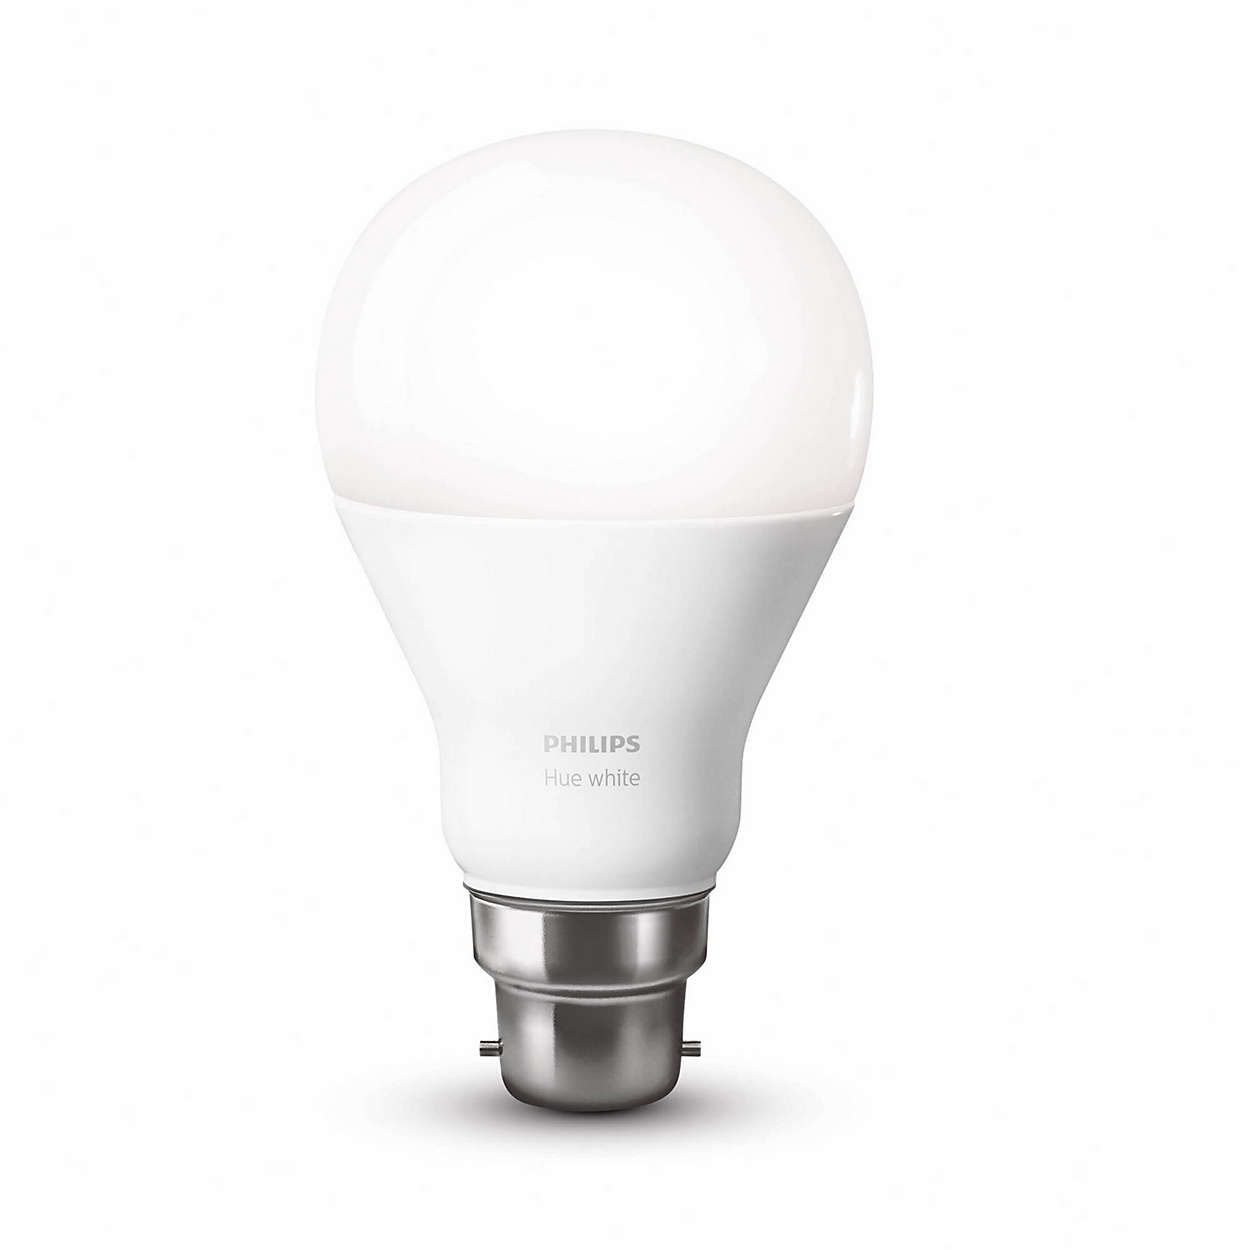 hue white single bulb b22 8718696449691 philips. Black Bedroom Furniture Sets. Home Design Ideas